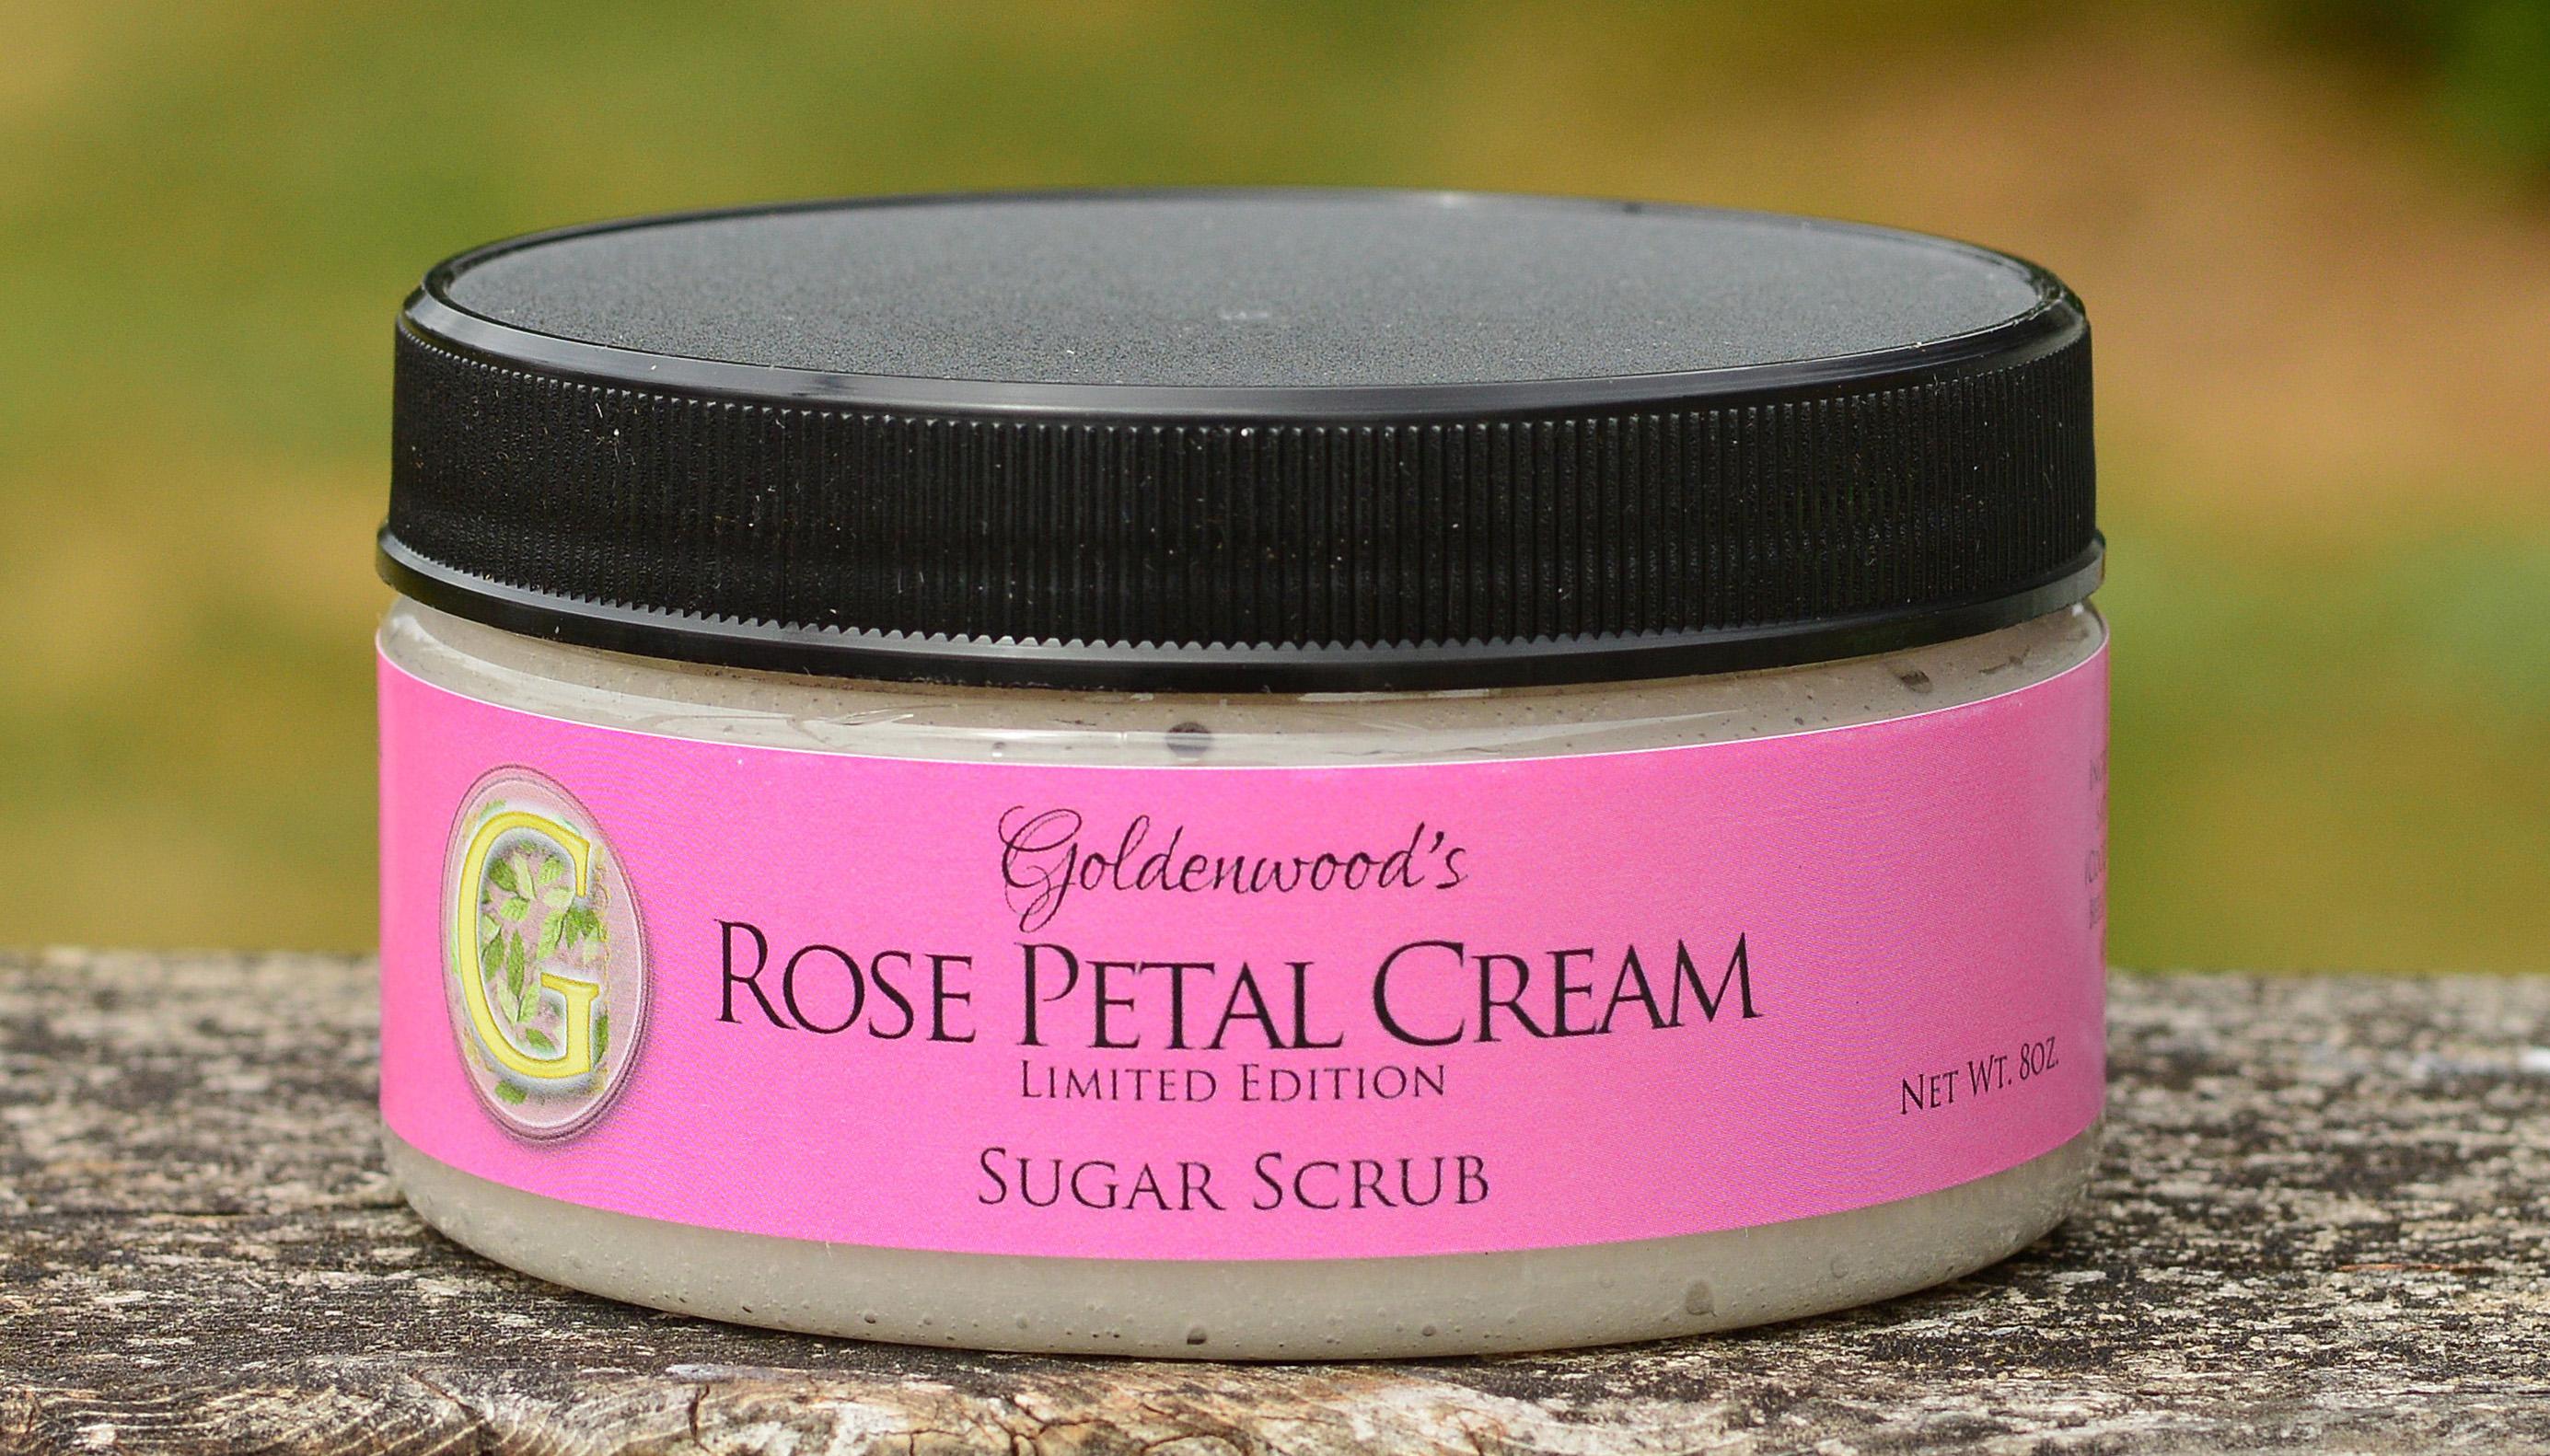 Rose Petal Cream Sugar Scrub